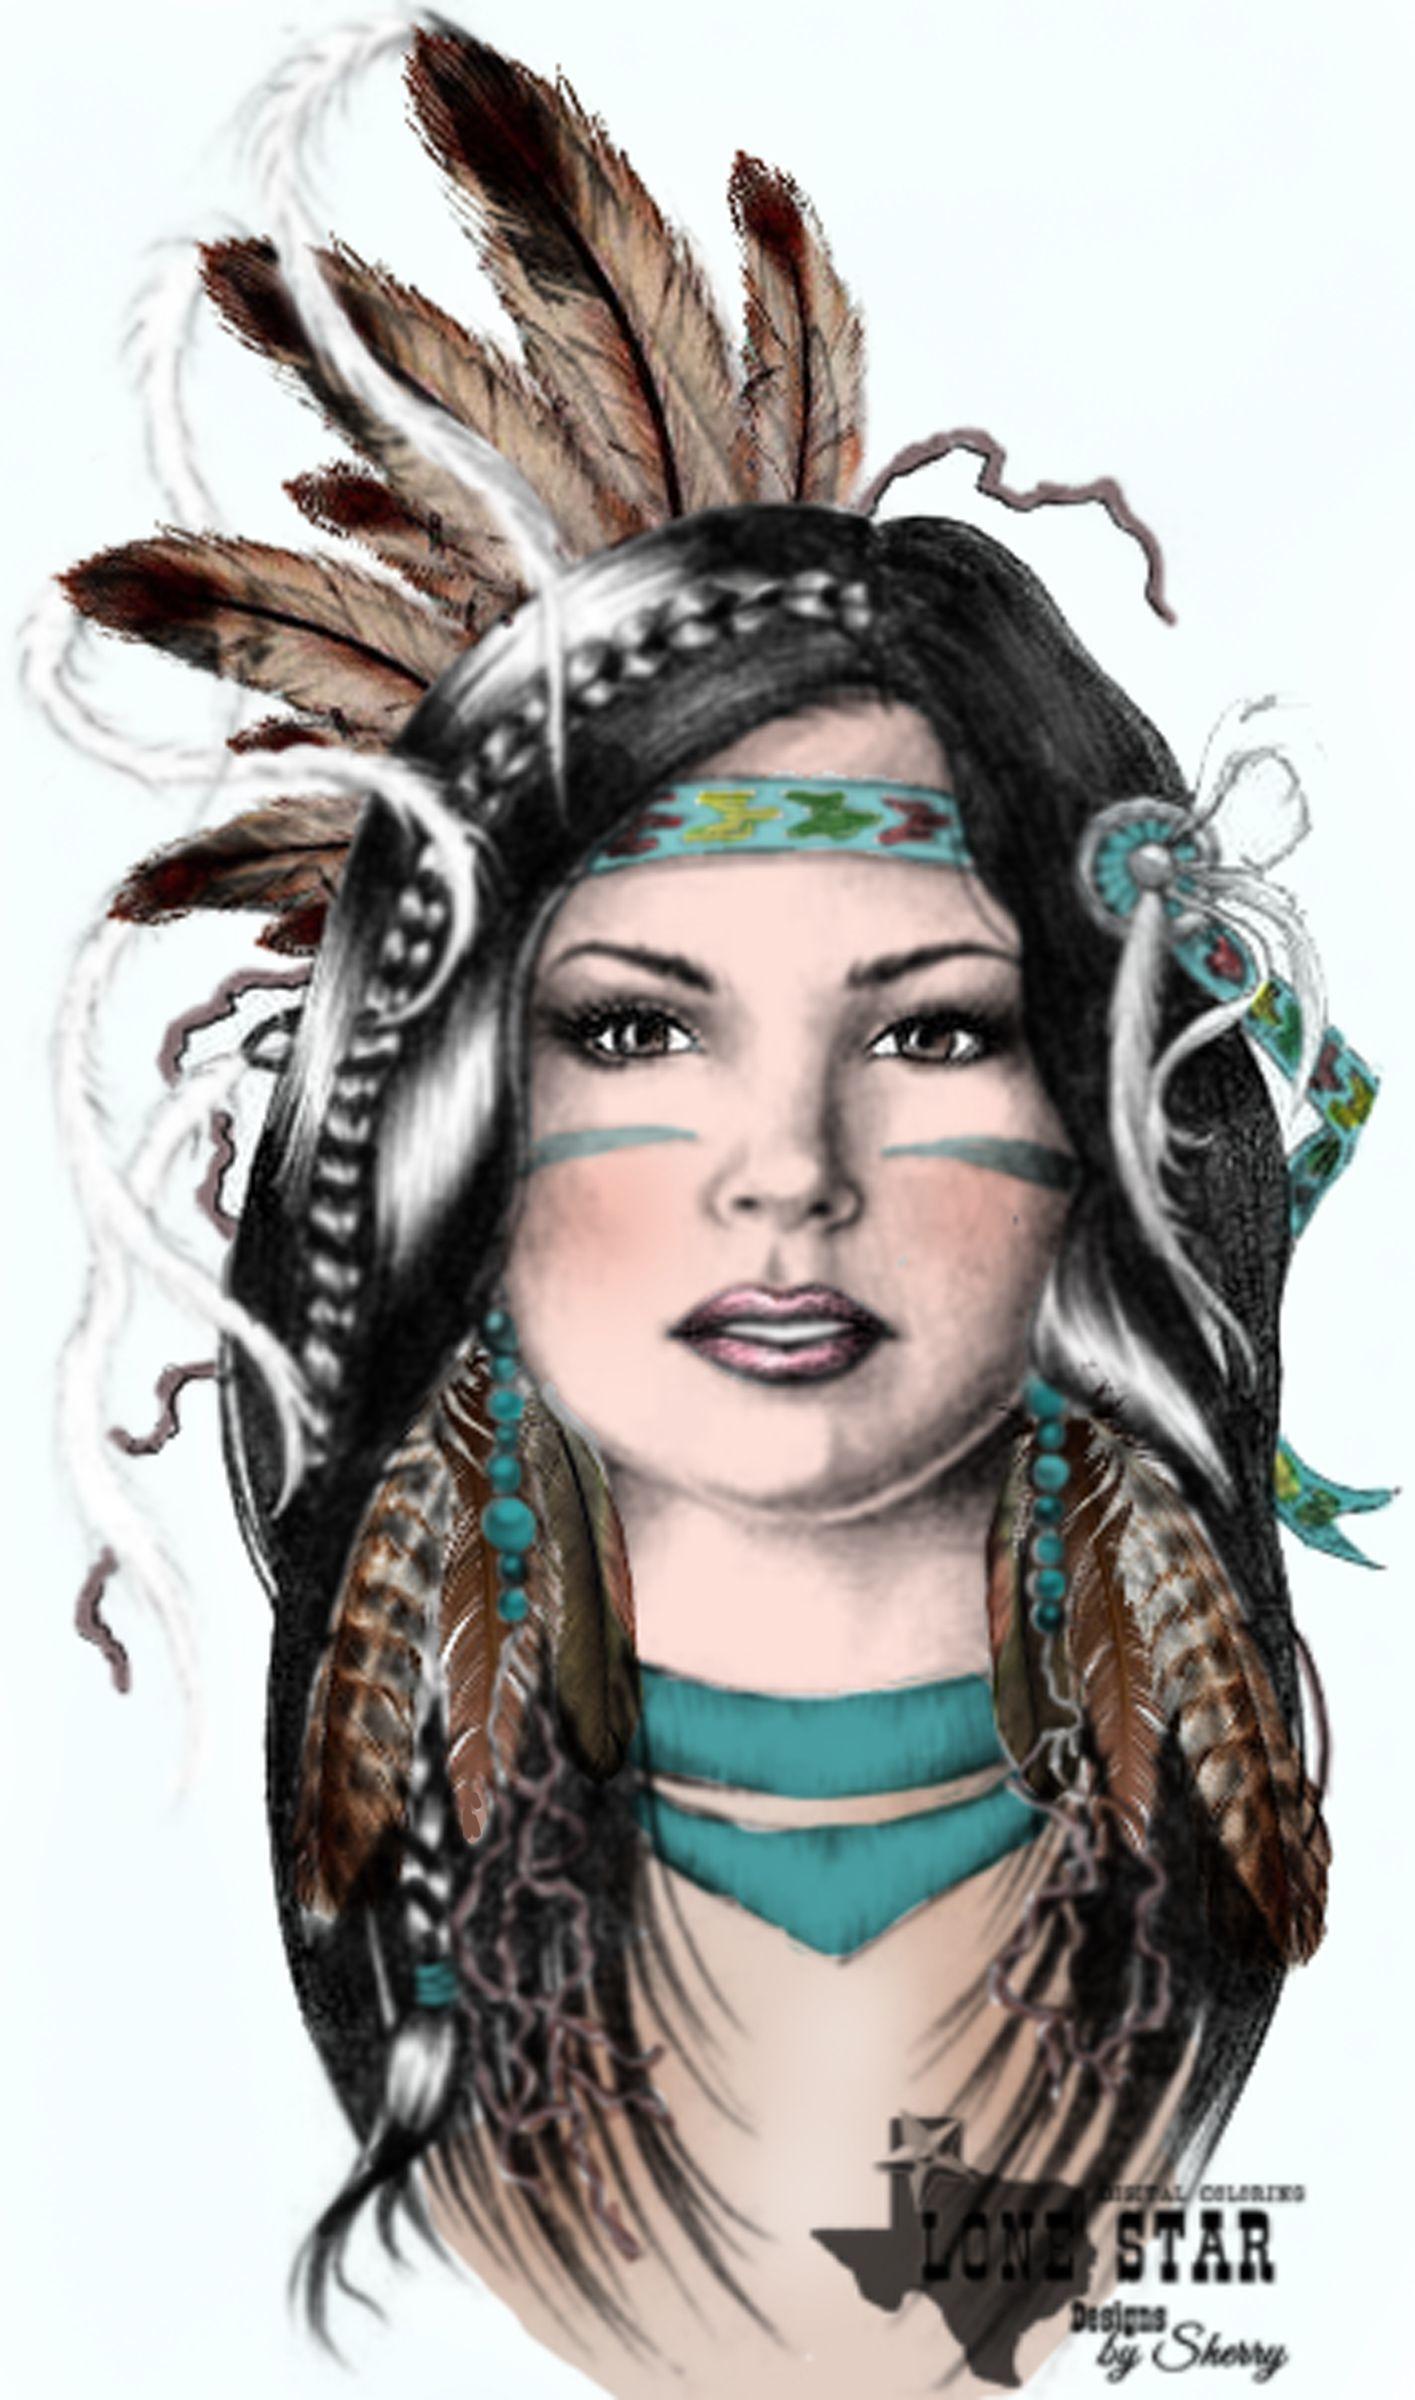 Digital Coloring by Sherry disegni indianinativi americani